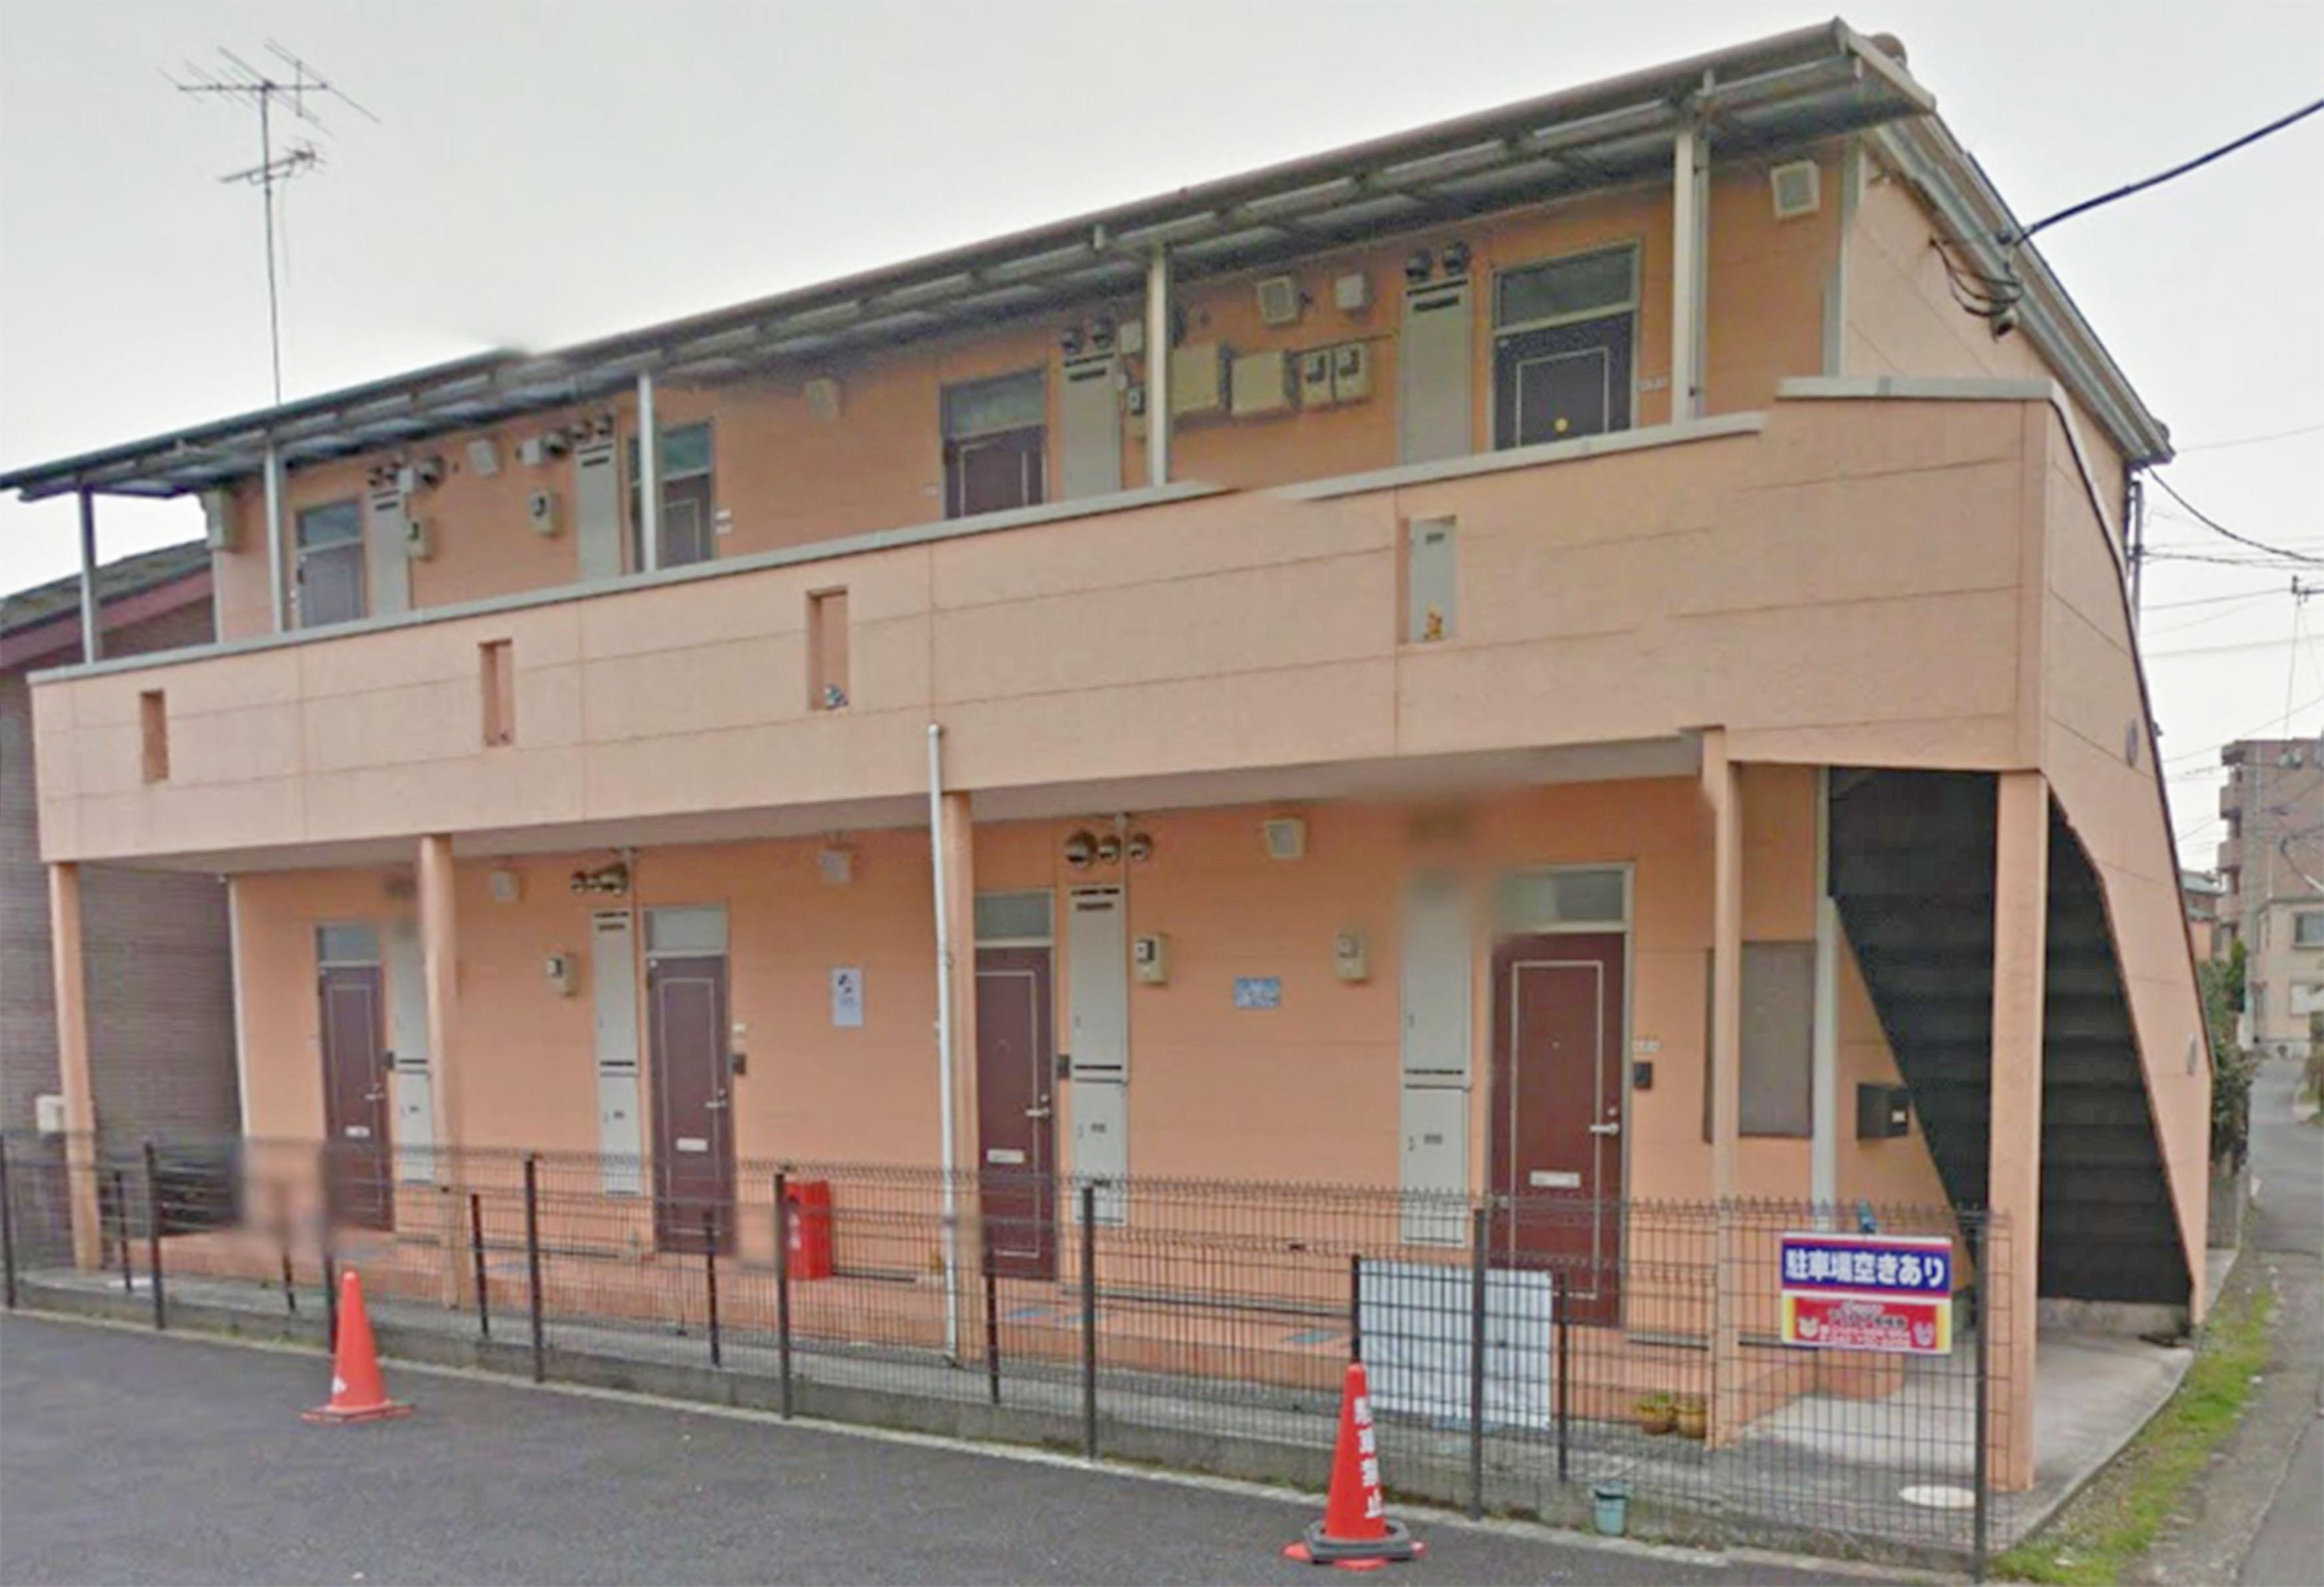 平成17年築!/JR横浜線『橋本駅』利用可能!/1K×8戸!/バストイレ別!/